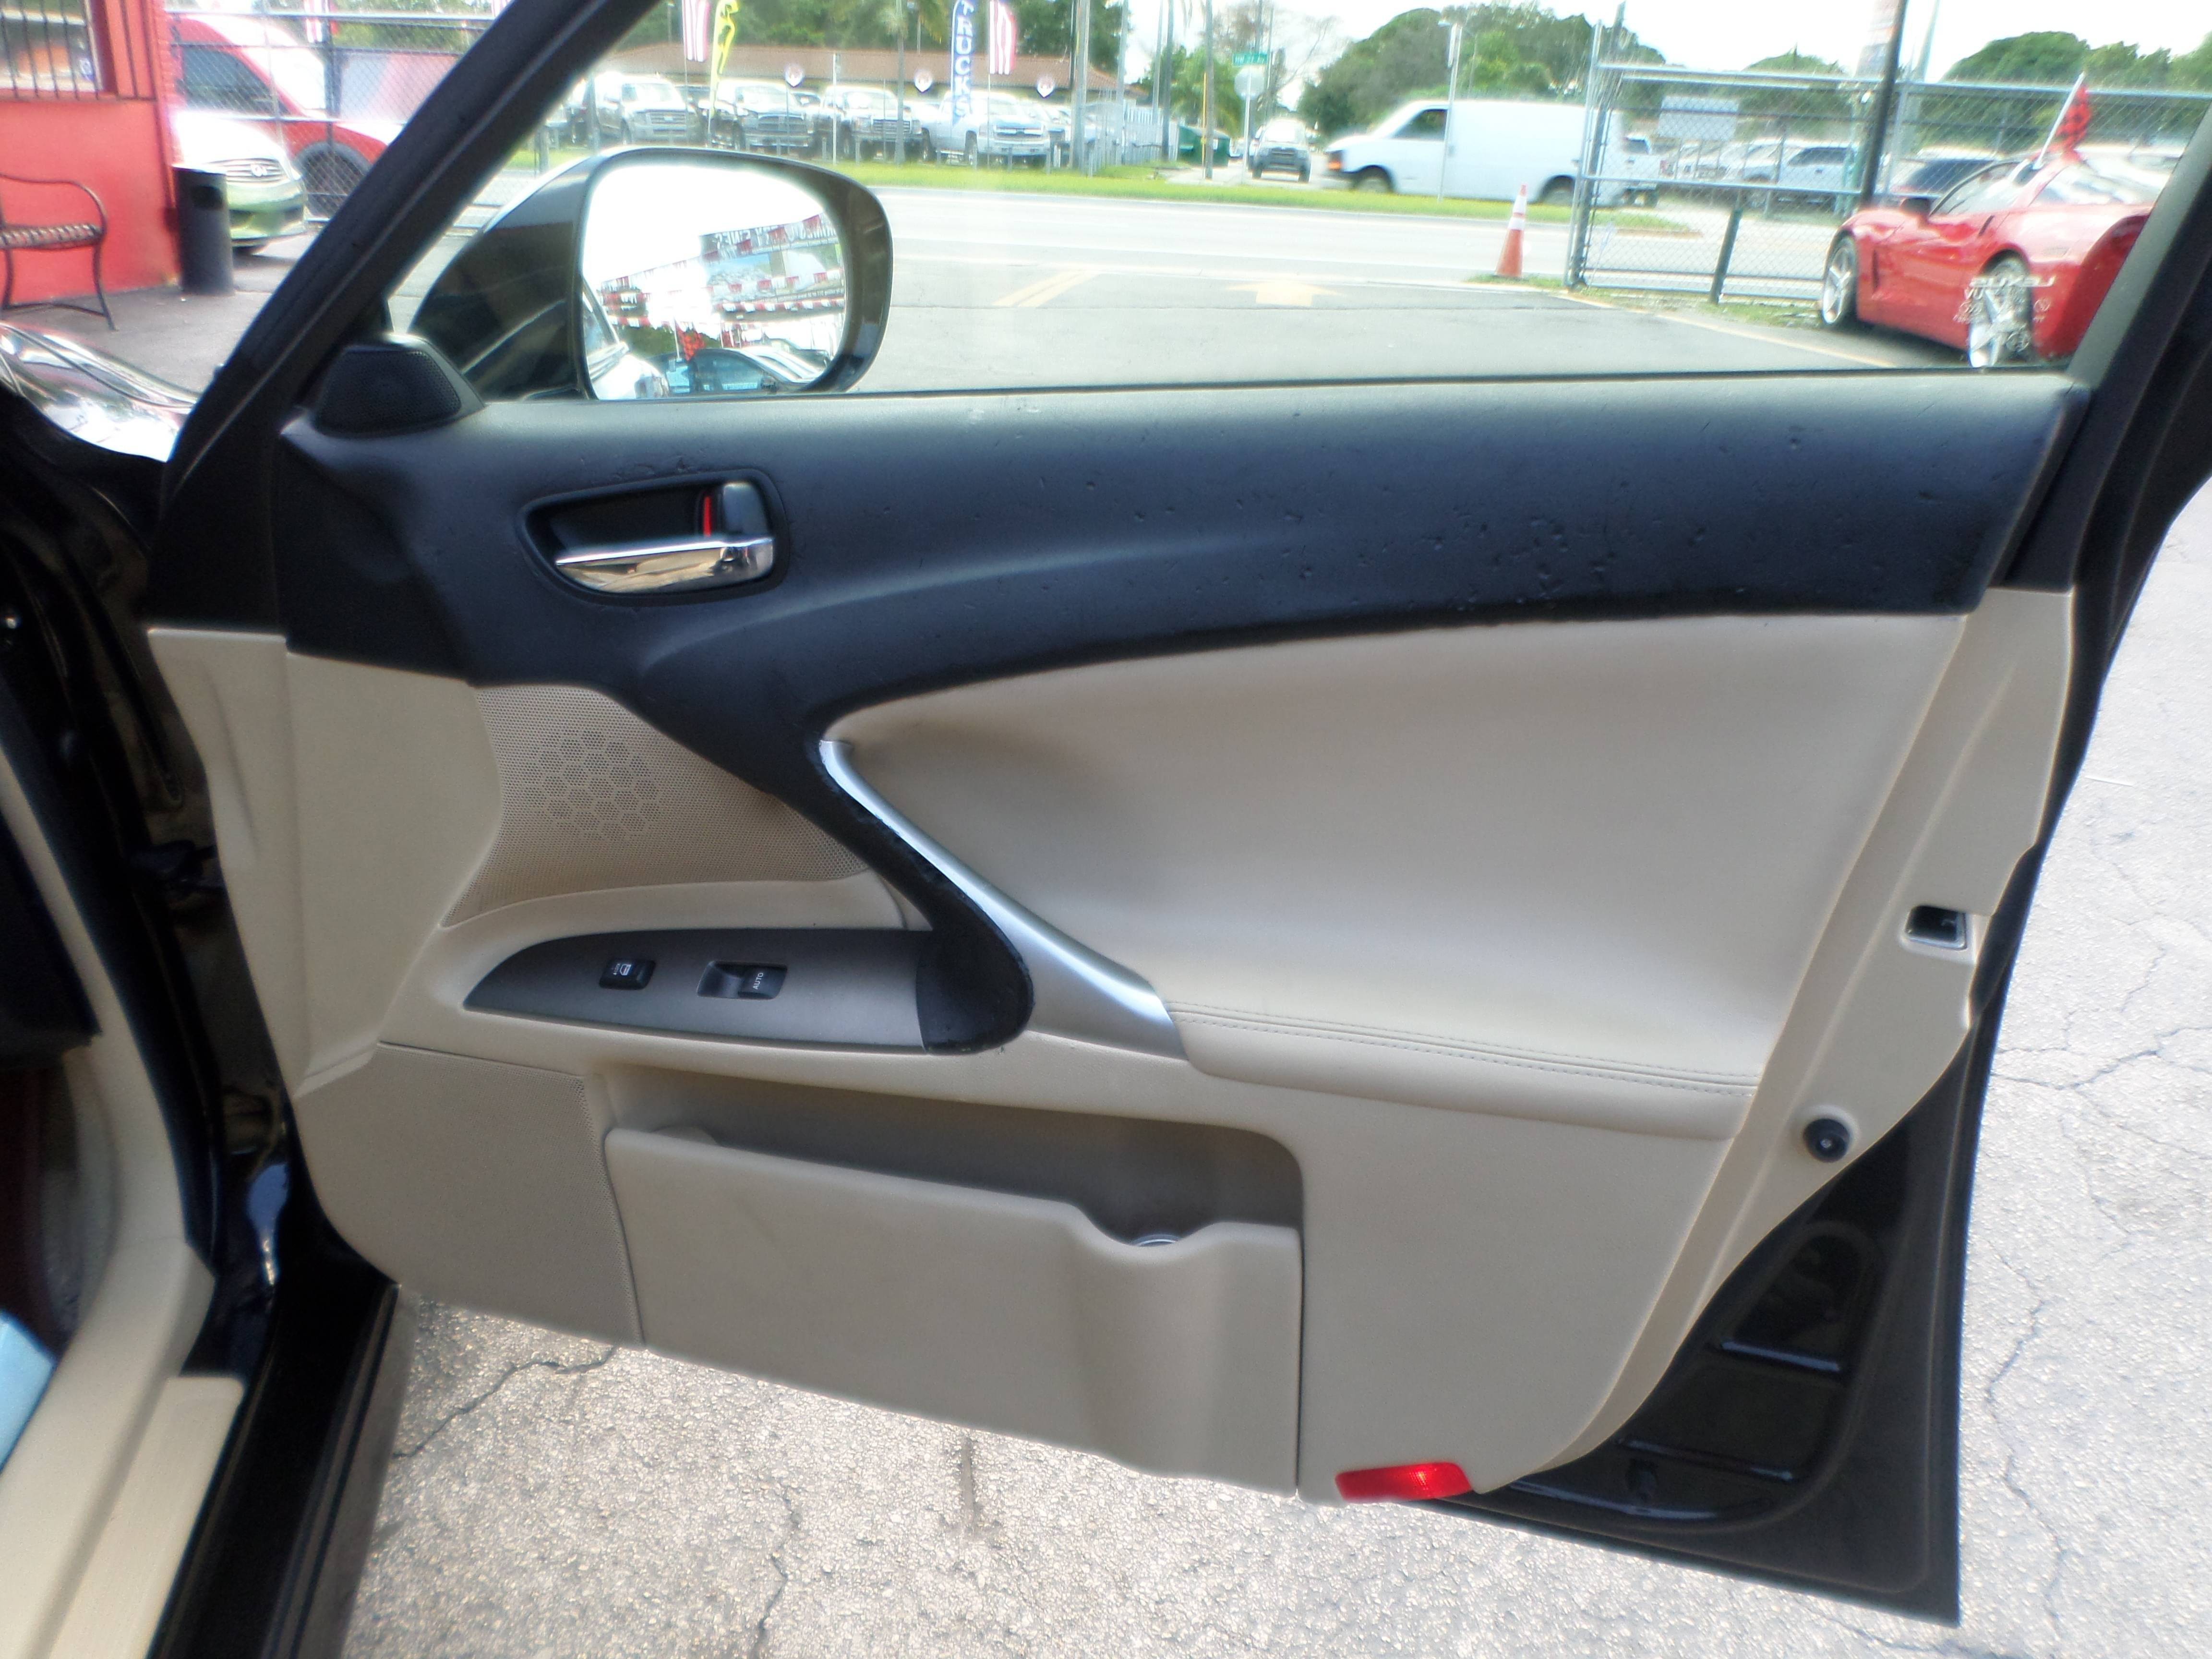 2007 Lexus IS, IS 250 6-Speed Manual